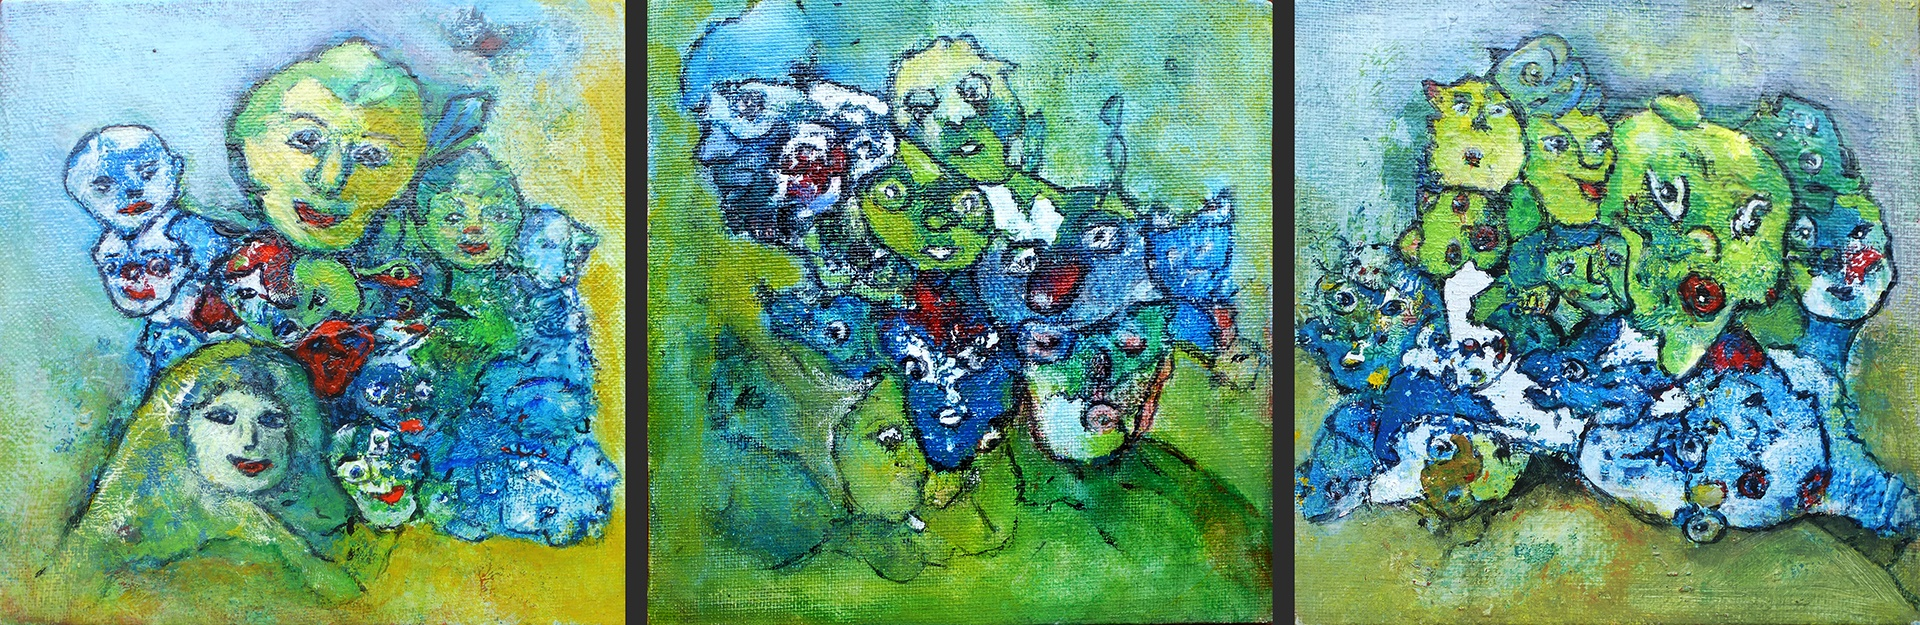 Arda Keizer_Clusters_acryl op board_3x 15x15